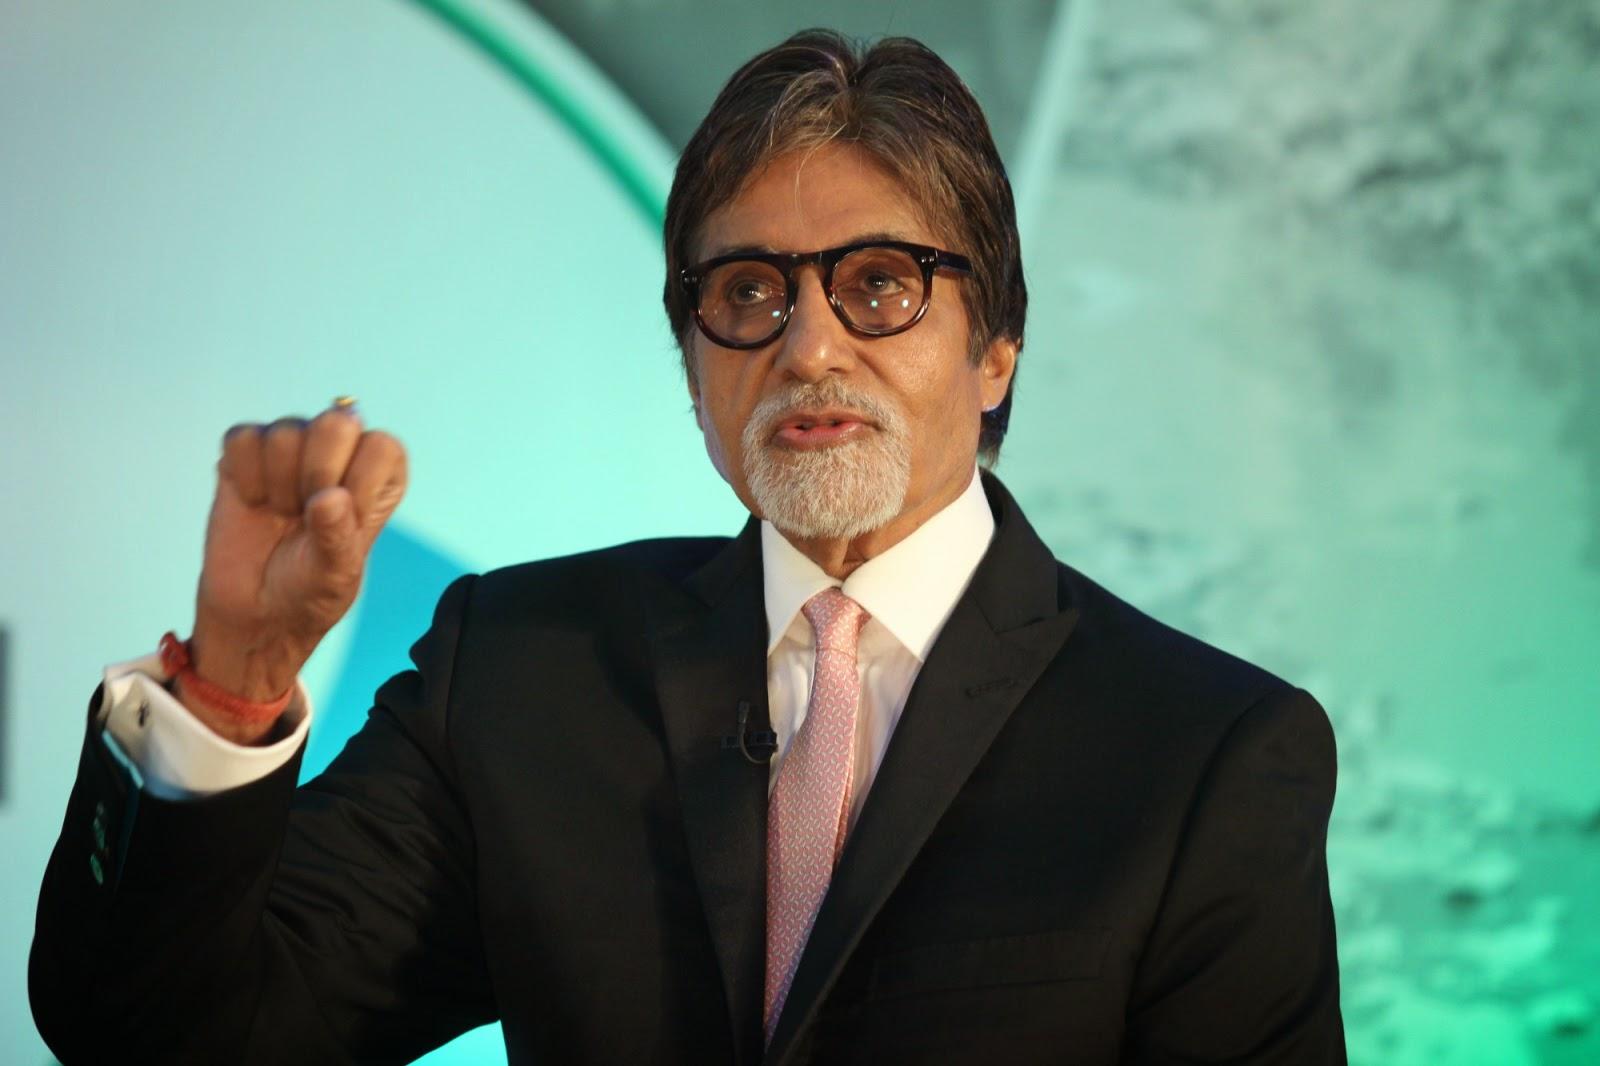 Amitabh Bachchan At Launch Of Dettol Banega Swachh India